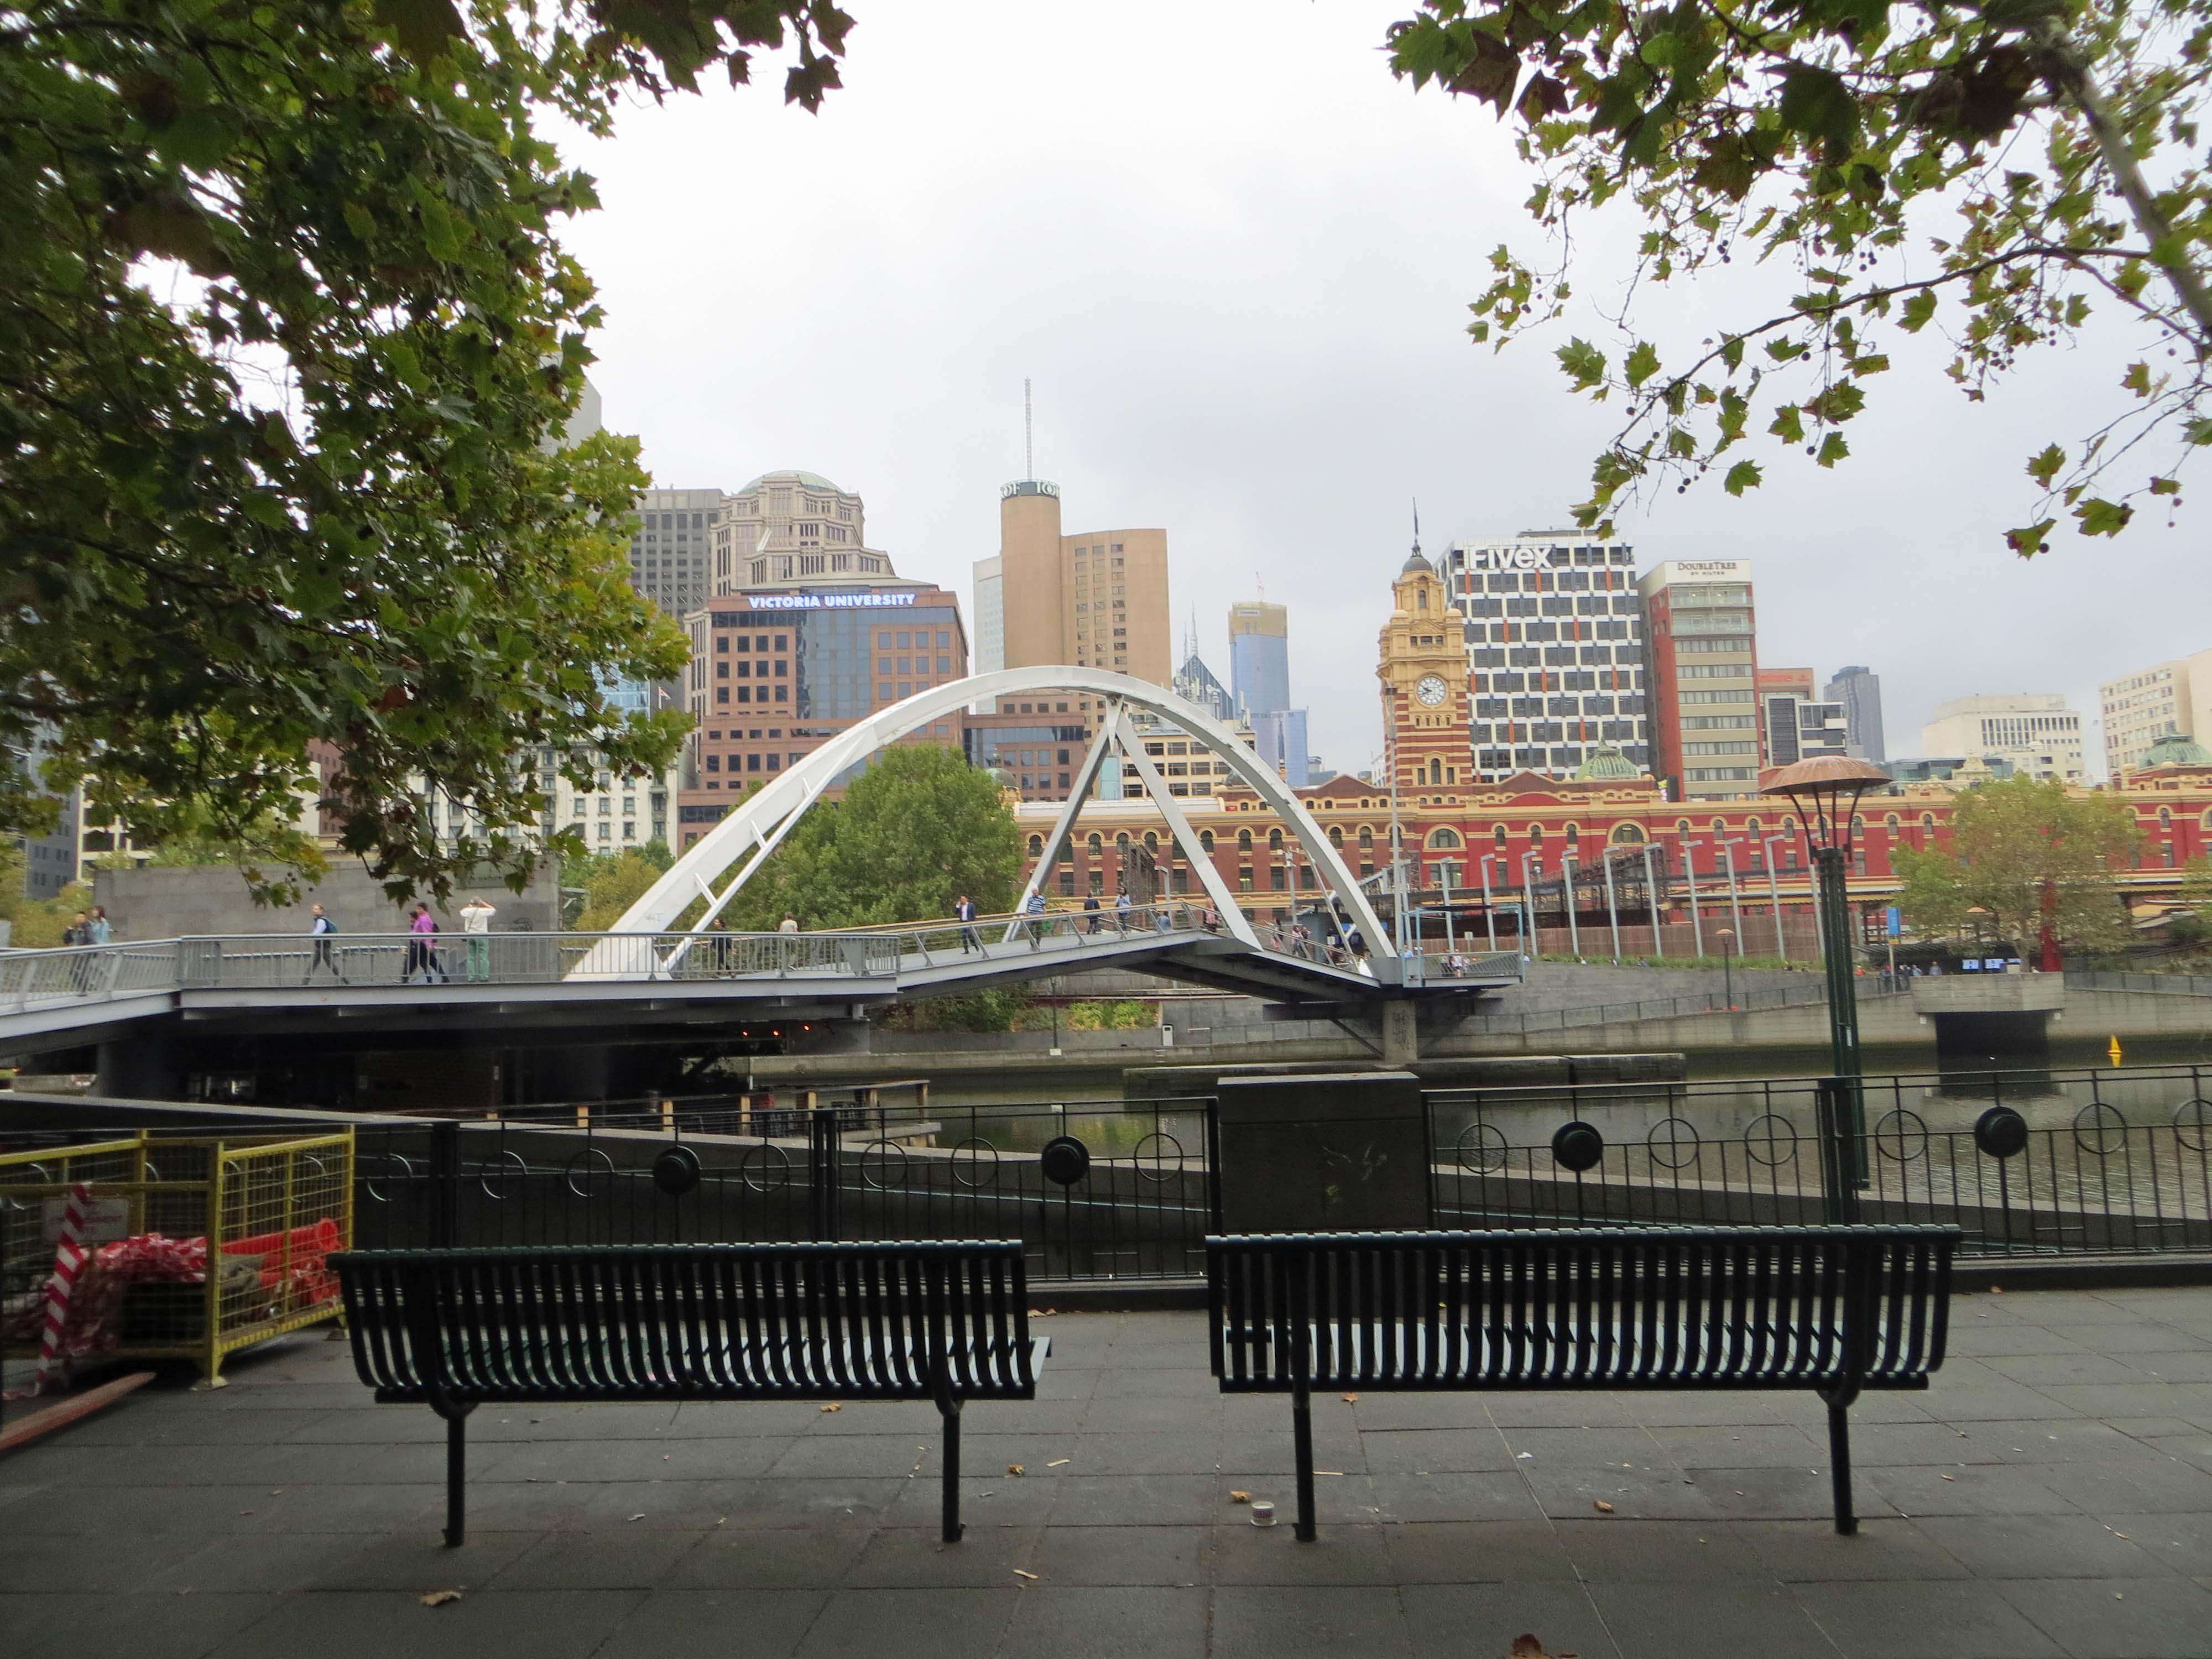 Yarra footbridge